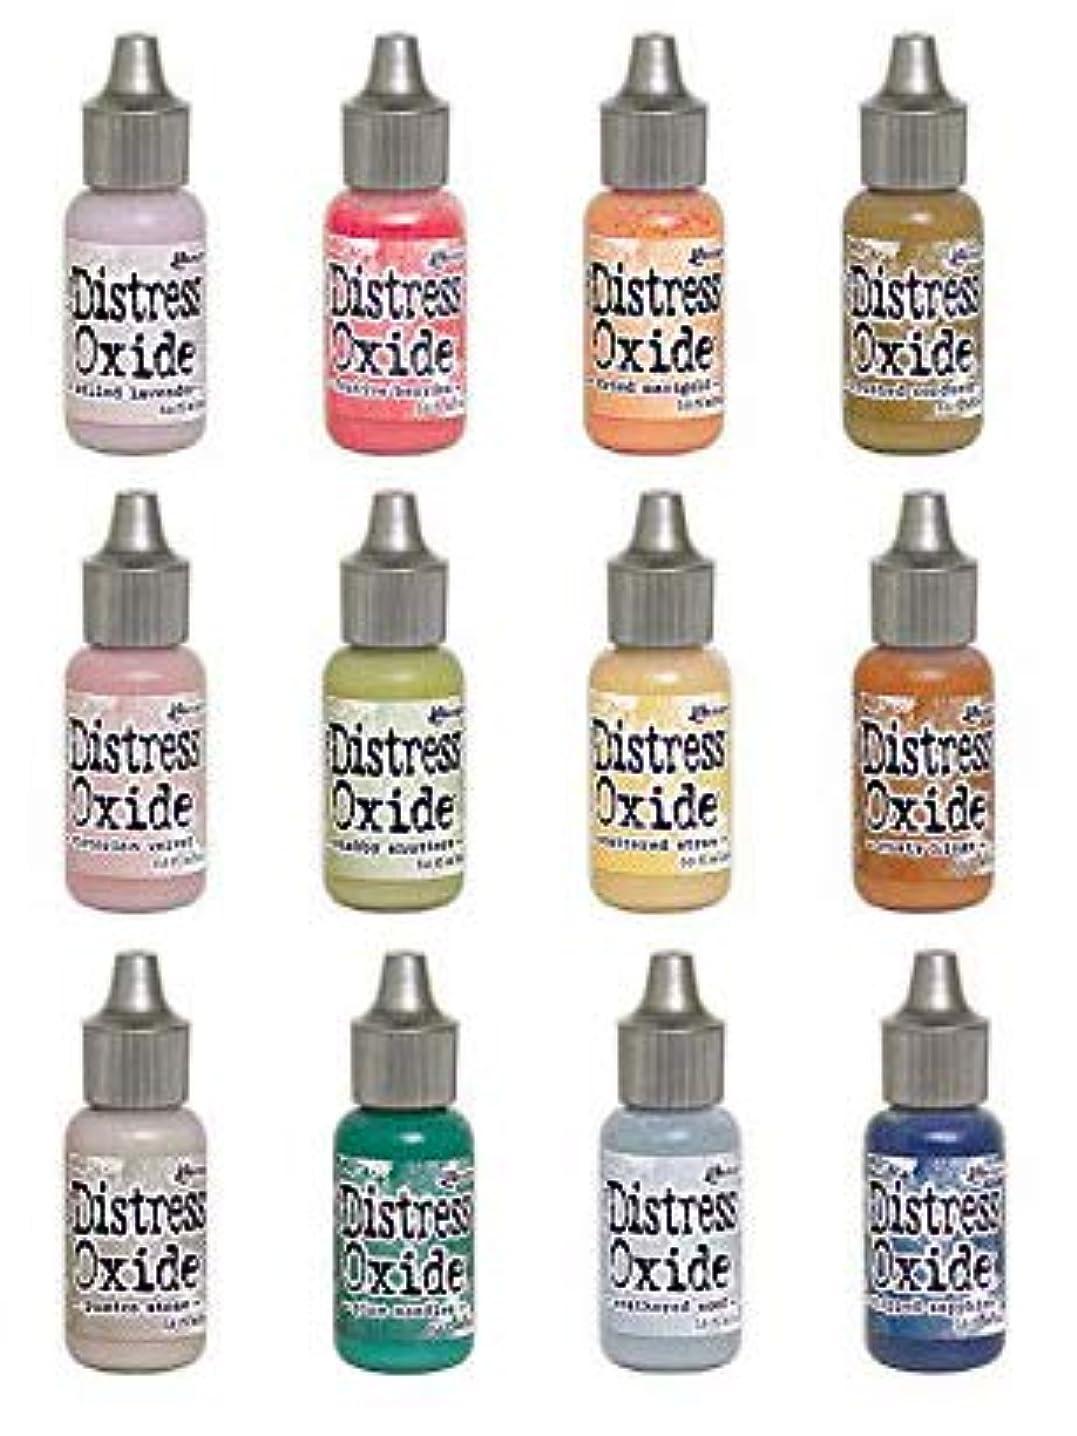 Ranger Tim Holtz Distress Oxide Reinker Bundle Of 12 Colors (Fall 2018 Release)